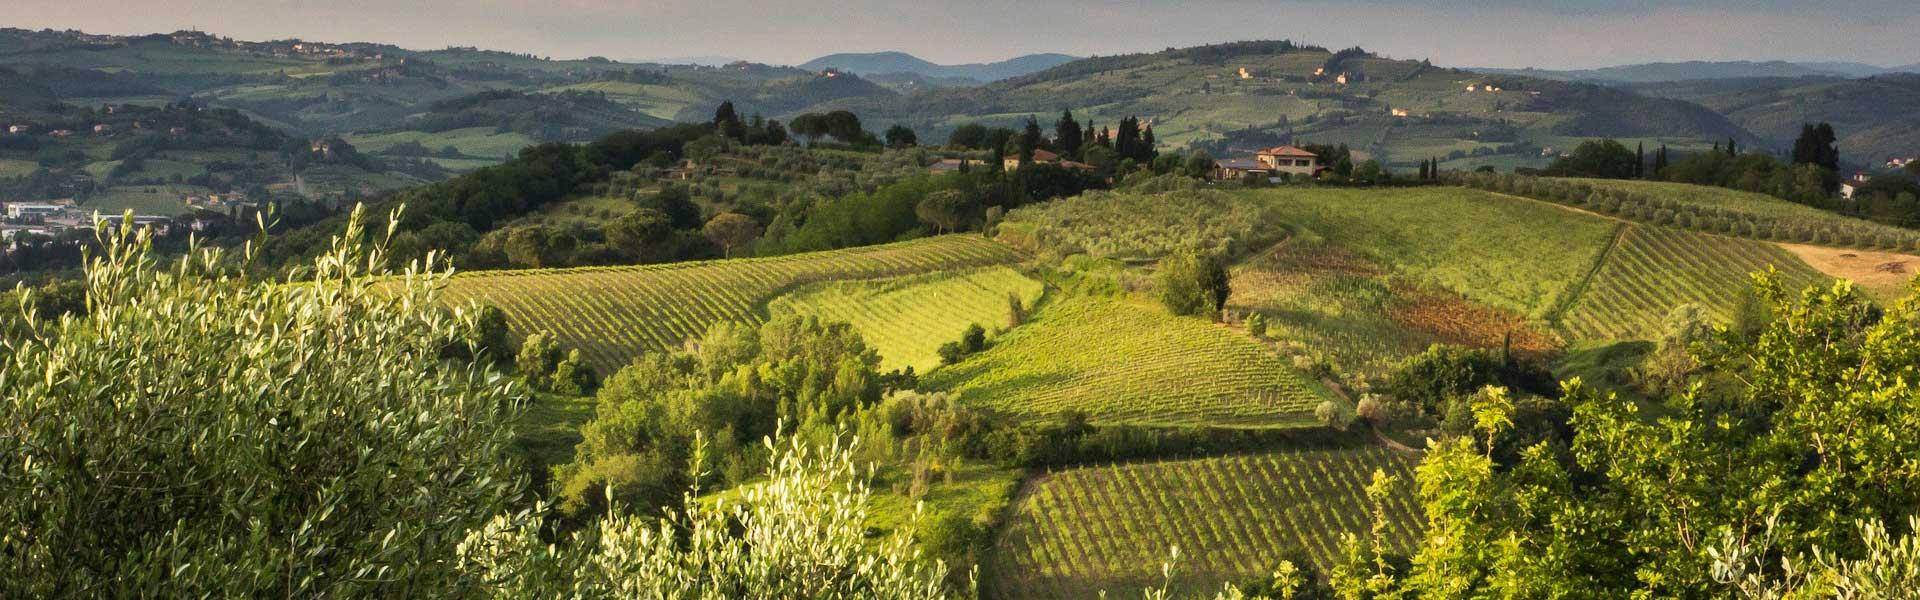 Tuscany and Rome 2 week itinerary